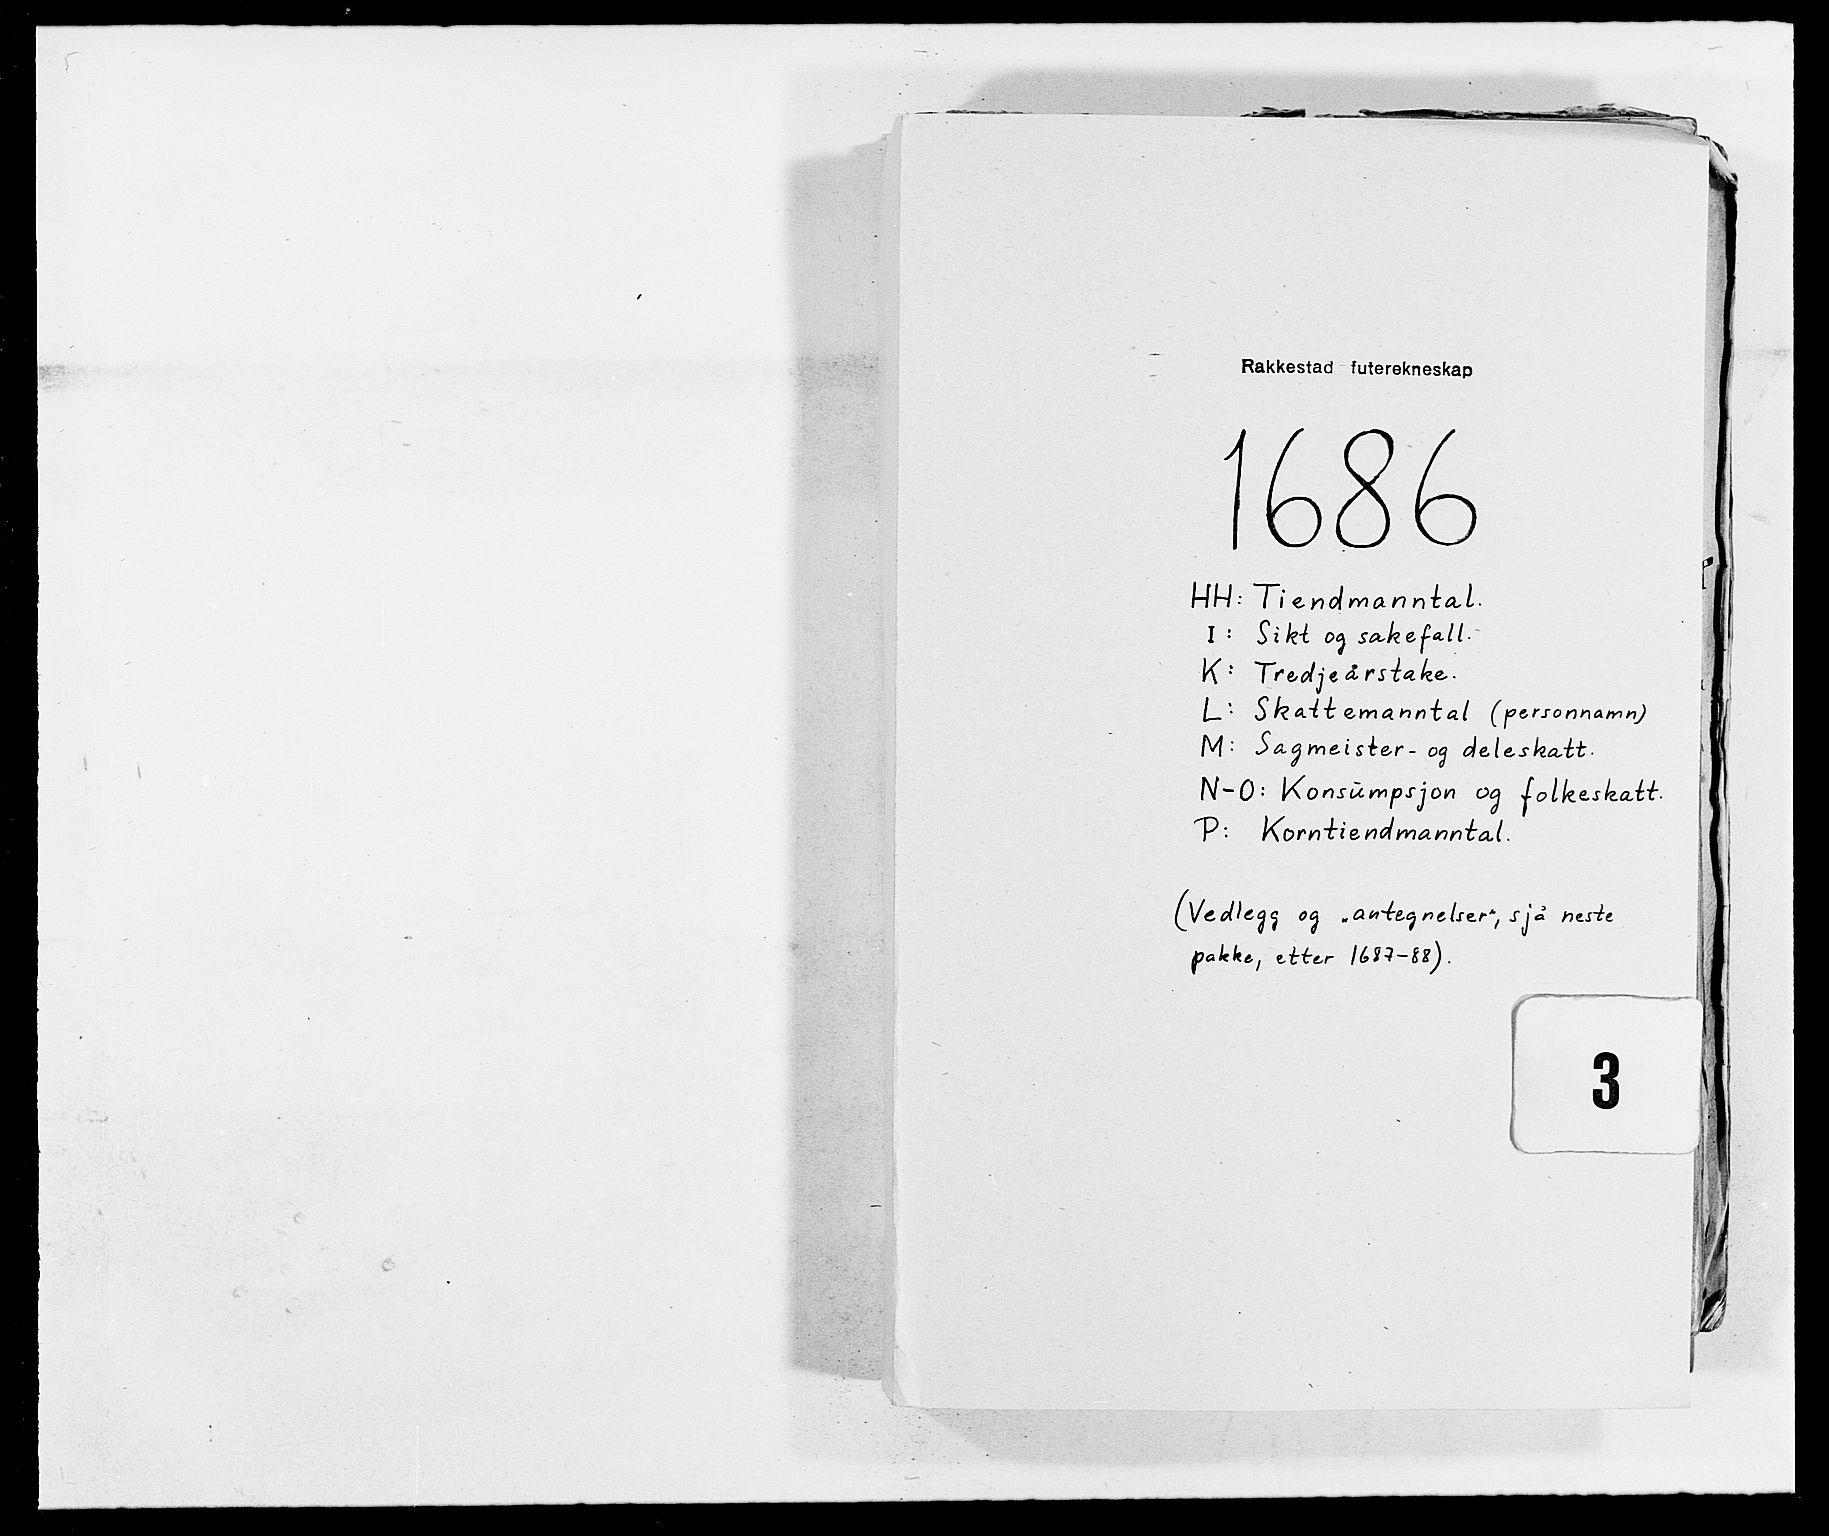 RA, Rentekammeret inntil 1814, Reviderte regnskaper, Fogderegnskap, R05/L0275: Fogderegnskap Rakkestad, 1685-1686, s. 160